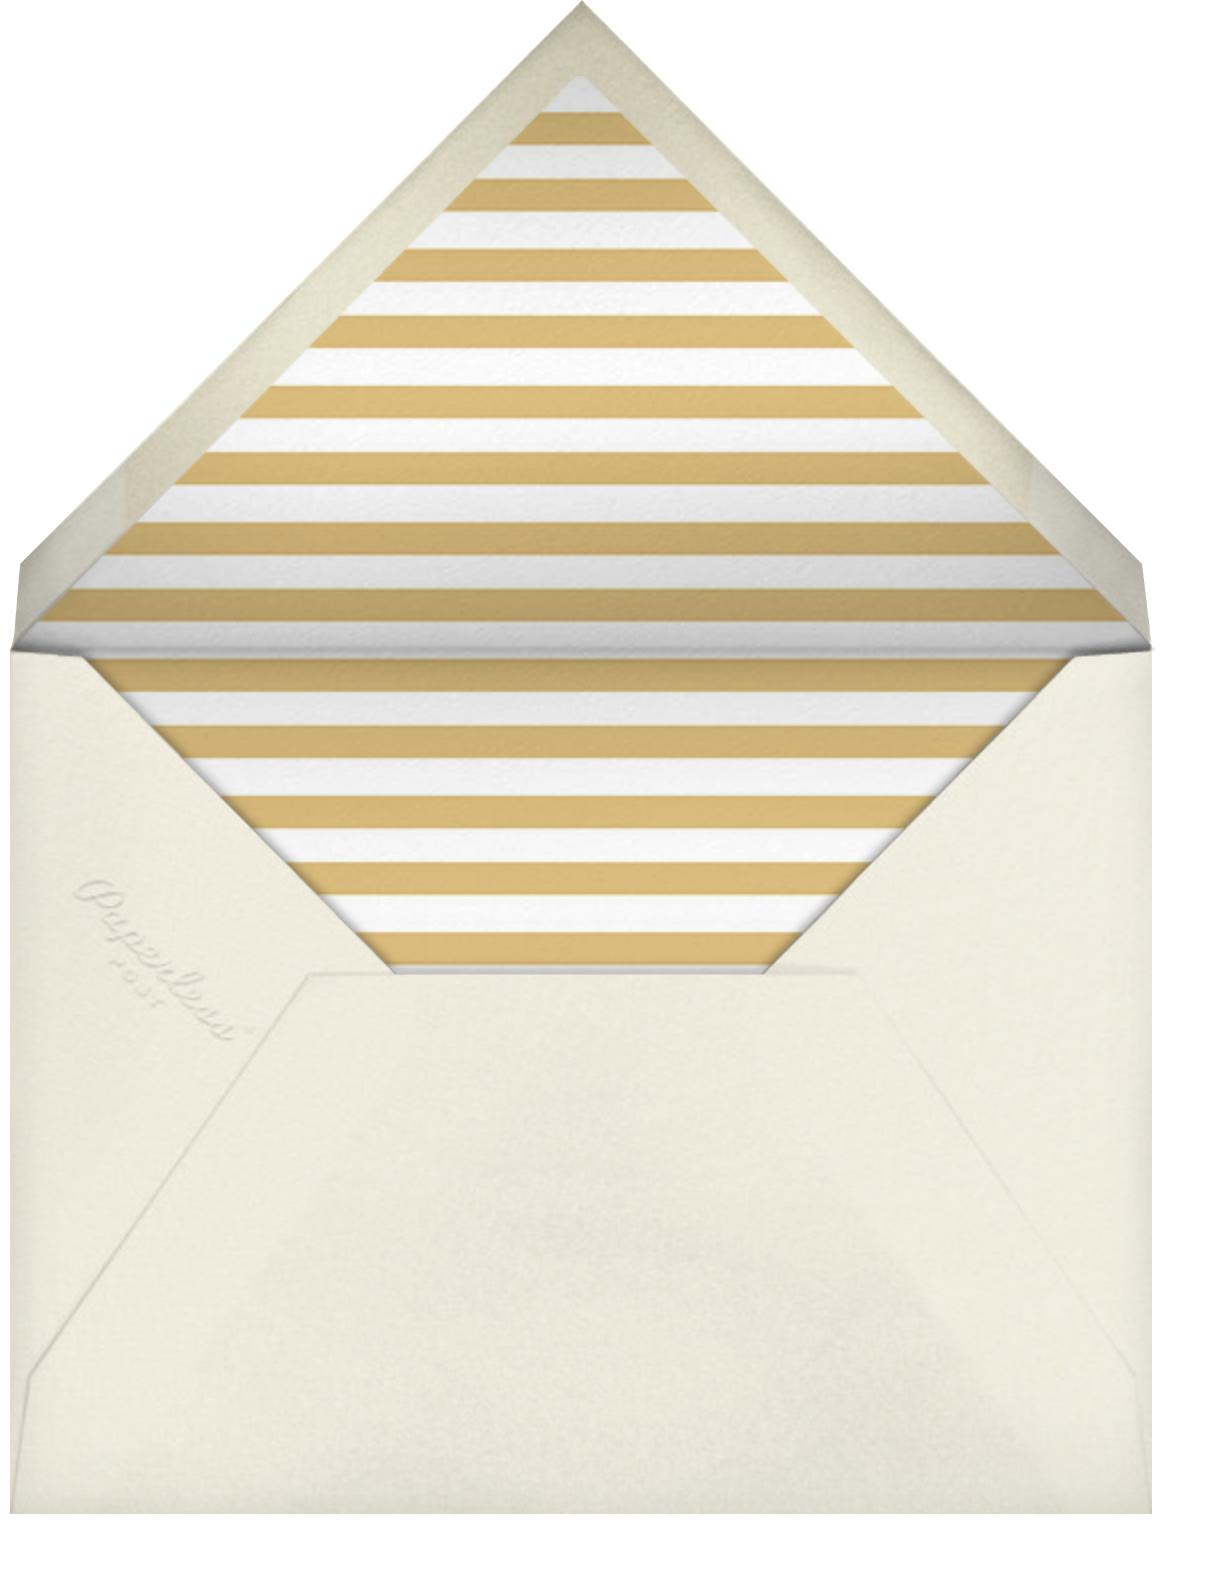 Cream (Square) - Paperless Post - Graduation party - envelope back